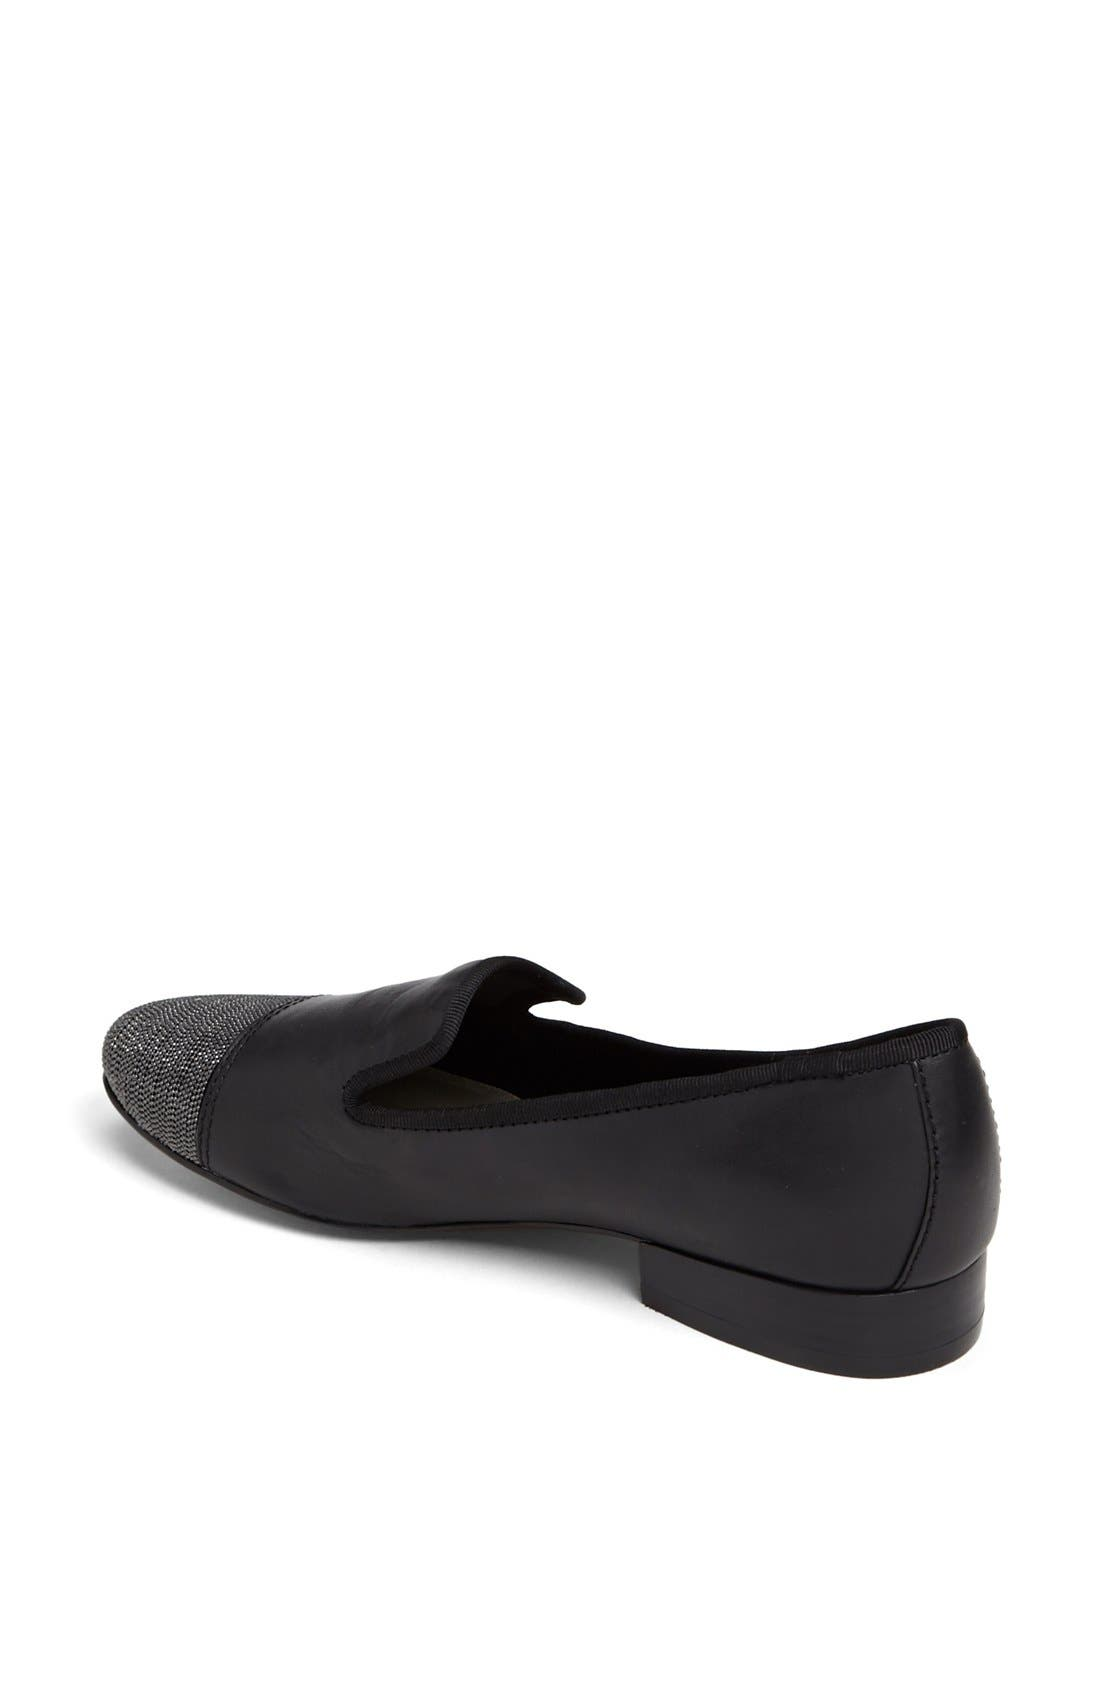 Alternate Image 2  - Dolce Vita Loafer Flat